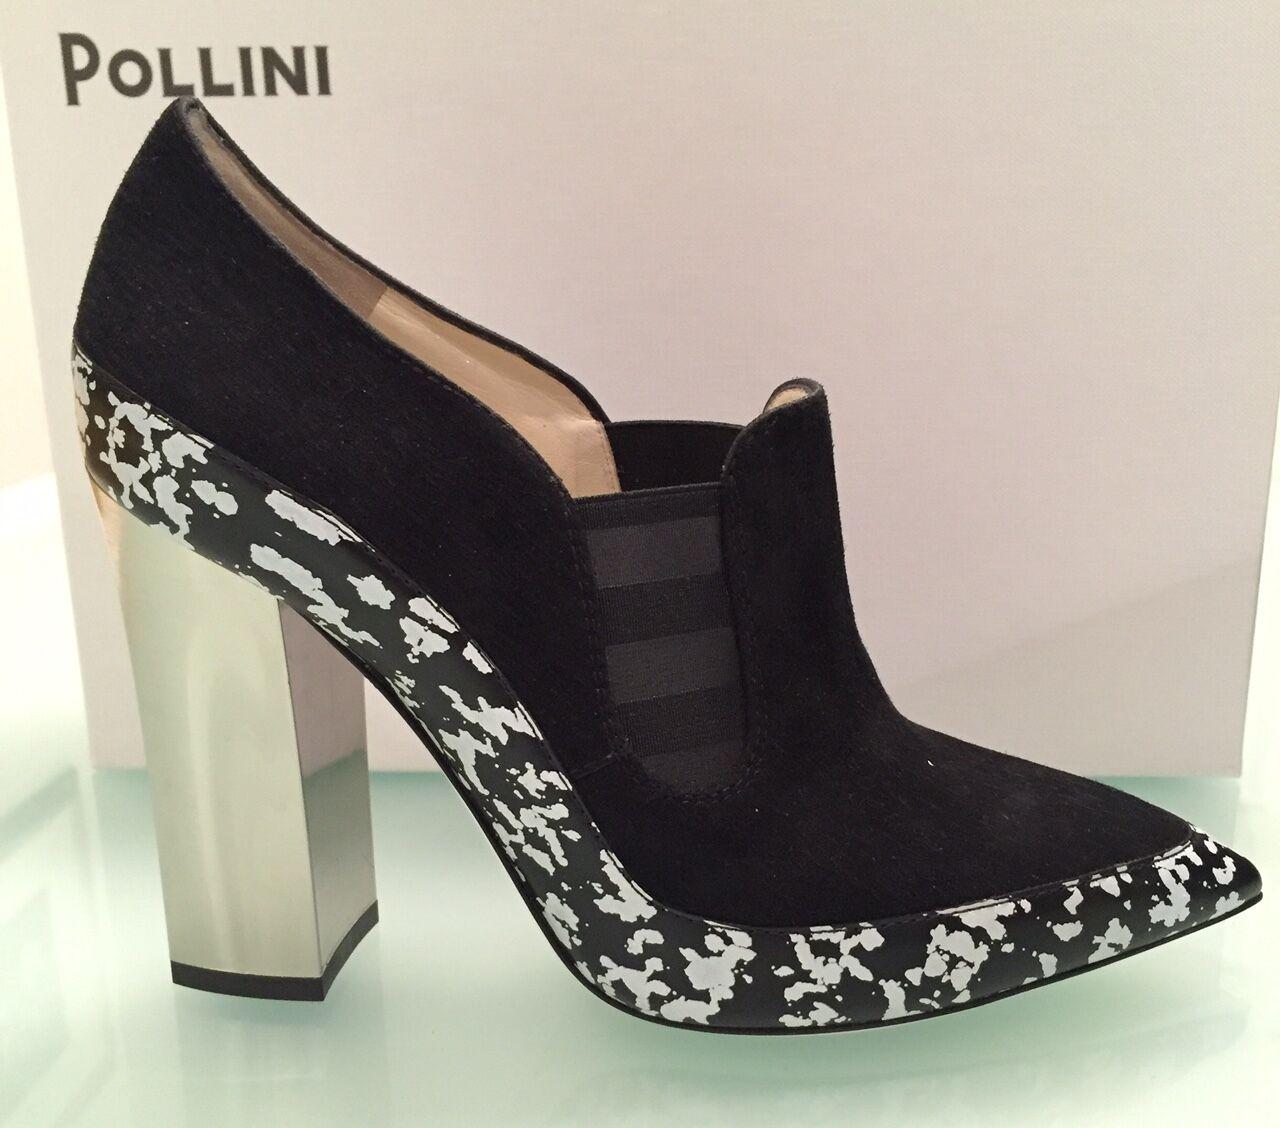 Pollini Pollini Pollini Gamuza Estilo Mocasín Couture Negro Mirrow Tacones Altos Bombas 37.5 Italia  ofrecemos varias marcas famosas